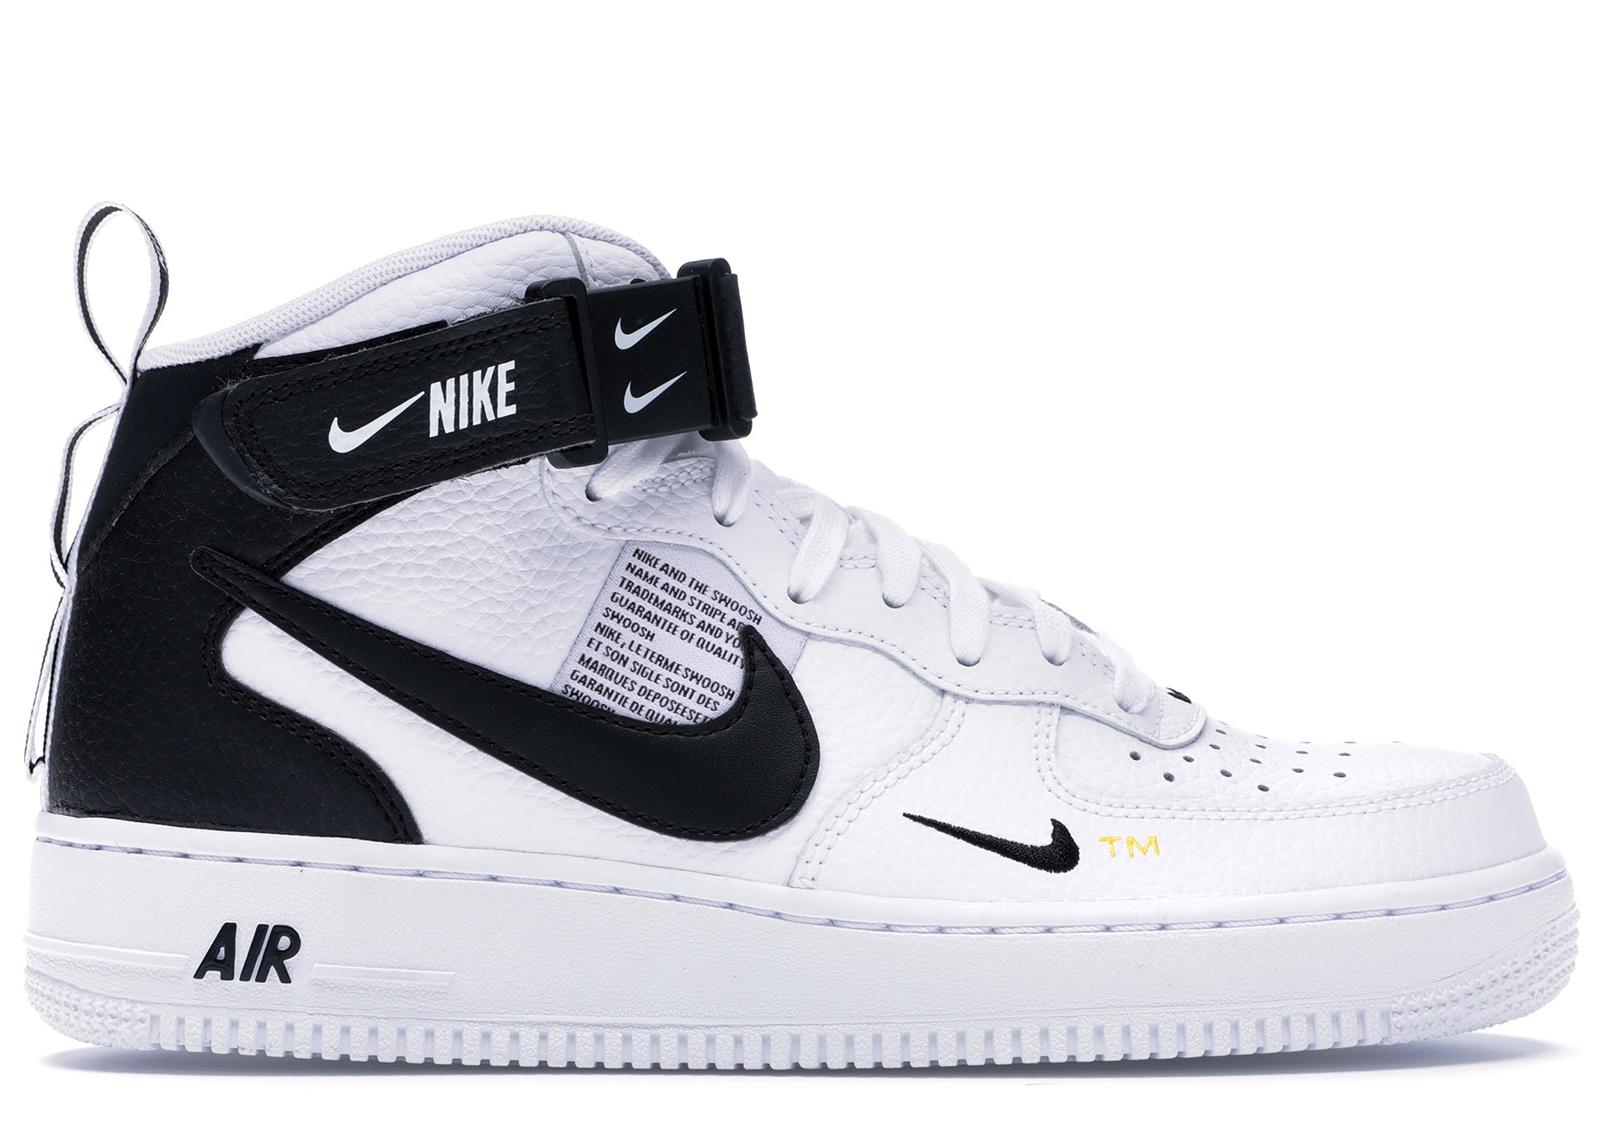 Nike Air Force 1 Mid Utility White Black - 804609-103